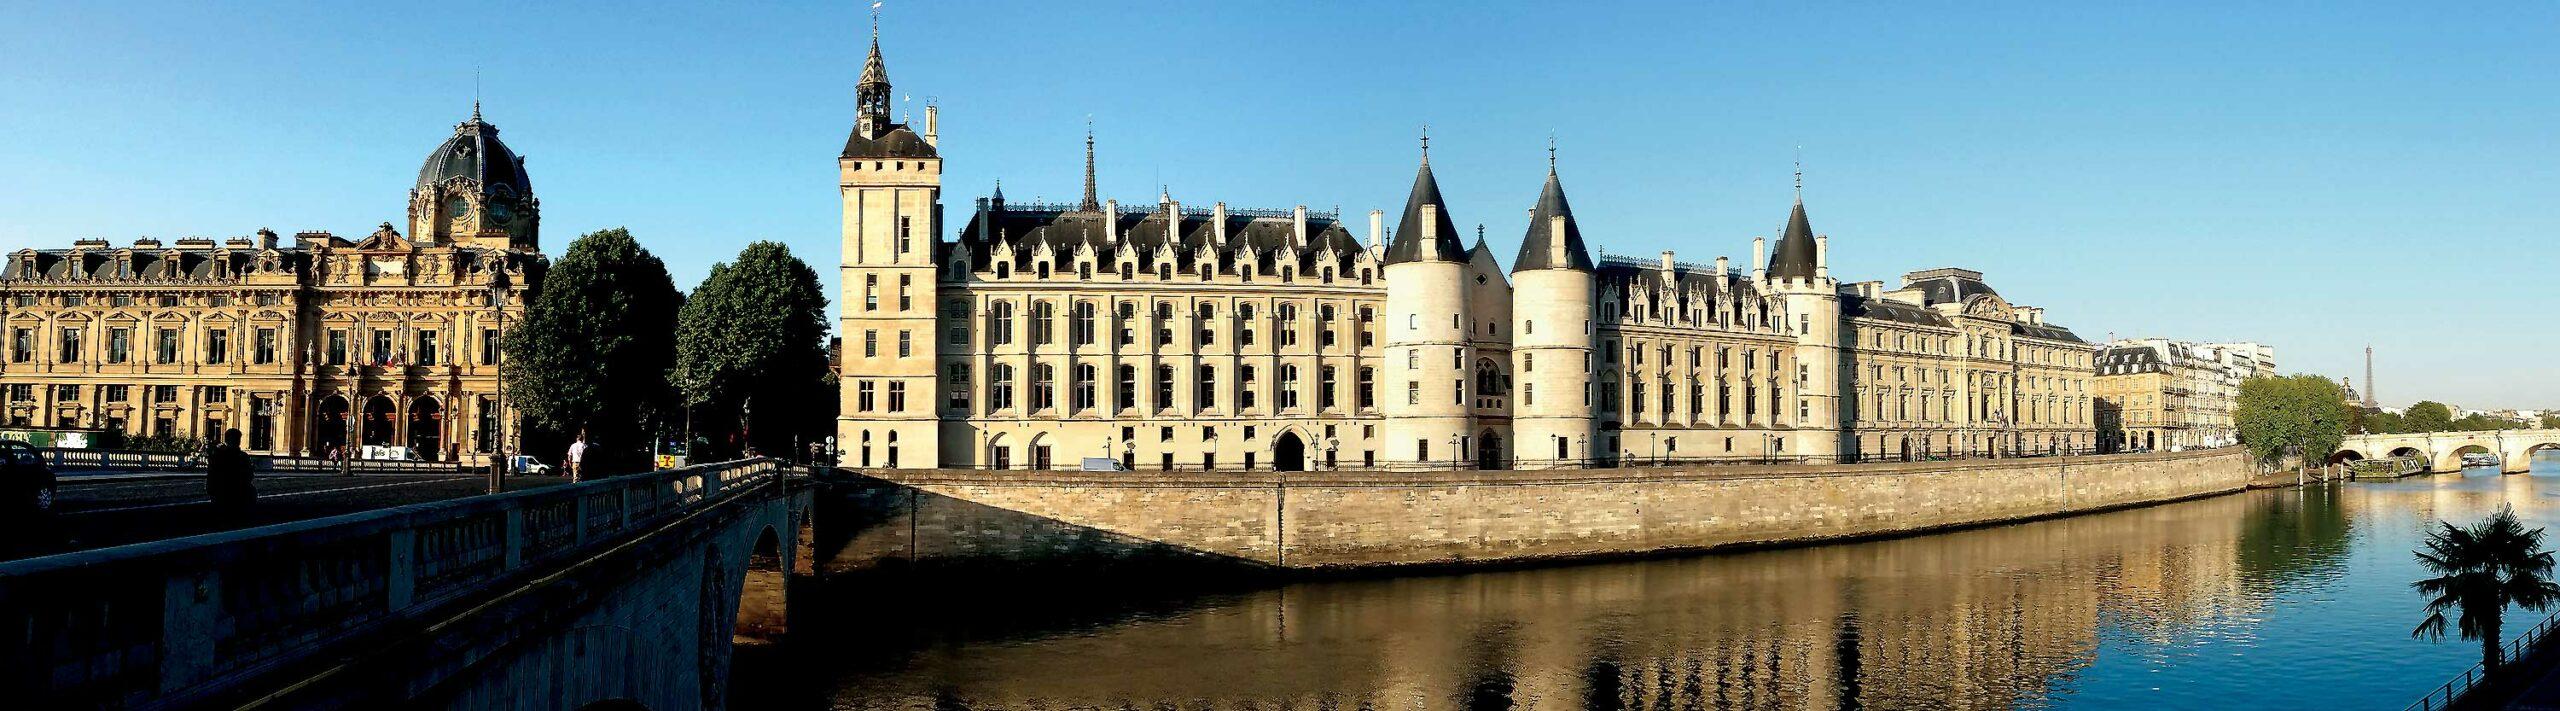 BGID-avocats-associes-international-Paris-Delacarte-Itzkovitc-Bourgeois-avocats-litige-contentieux-internationale